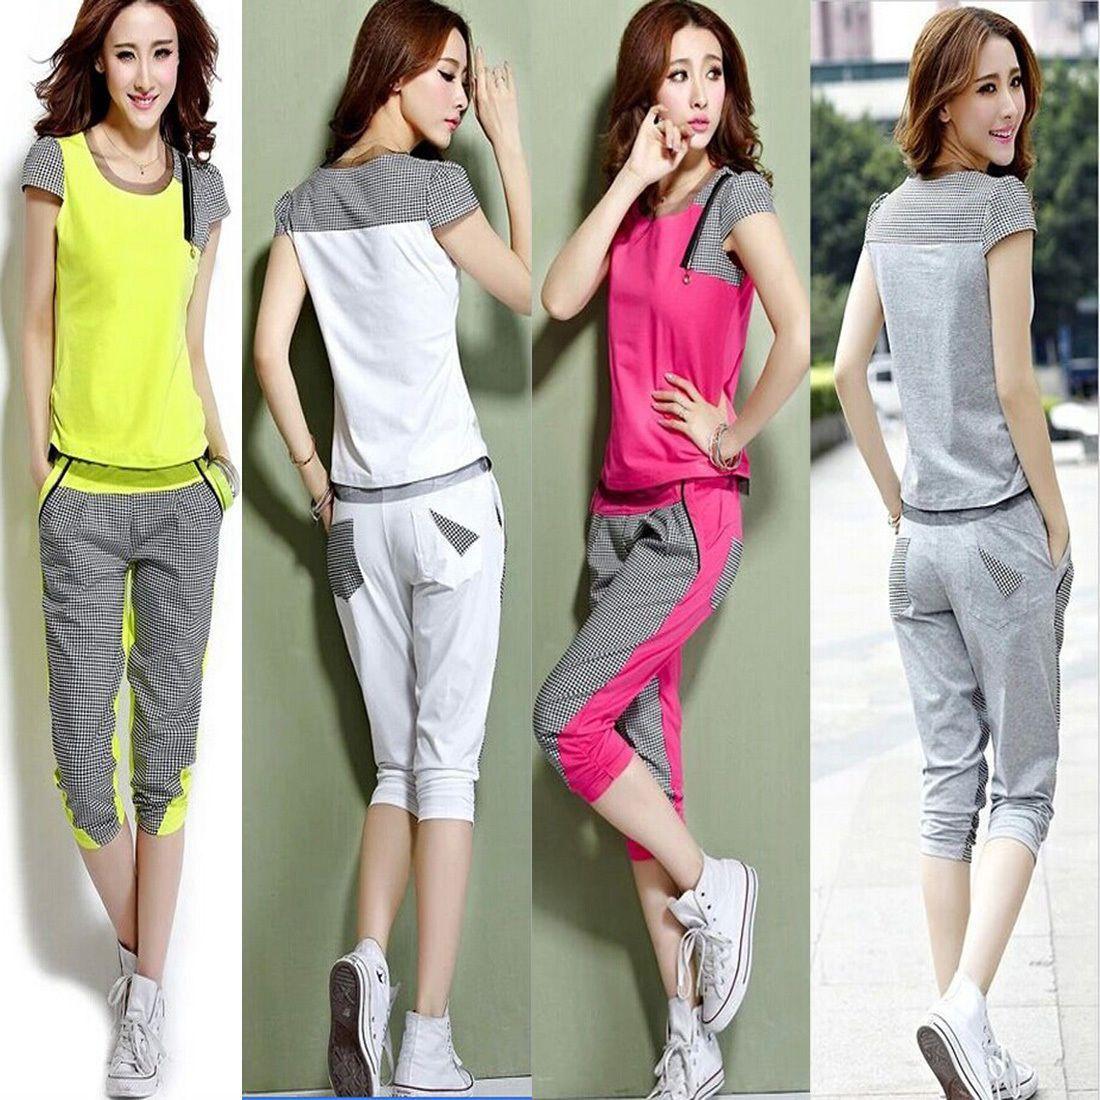 Pcs women short sleeve tops tshirt pants tracksuit sport sweat